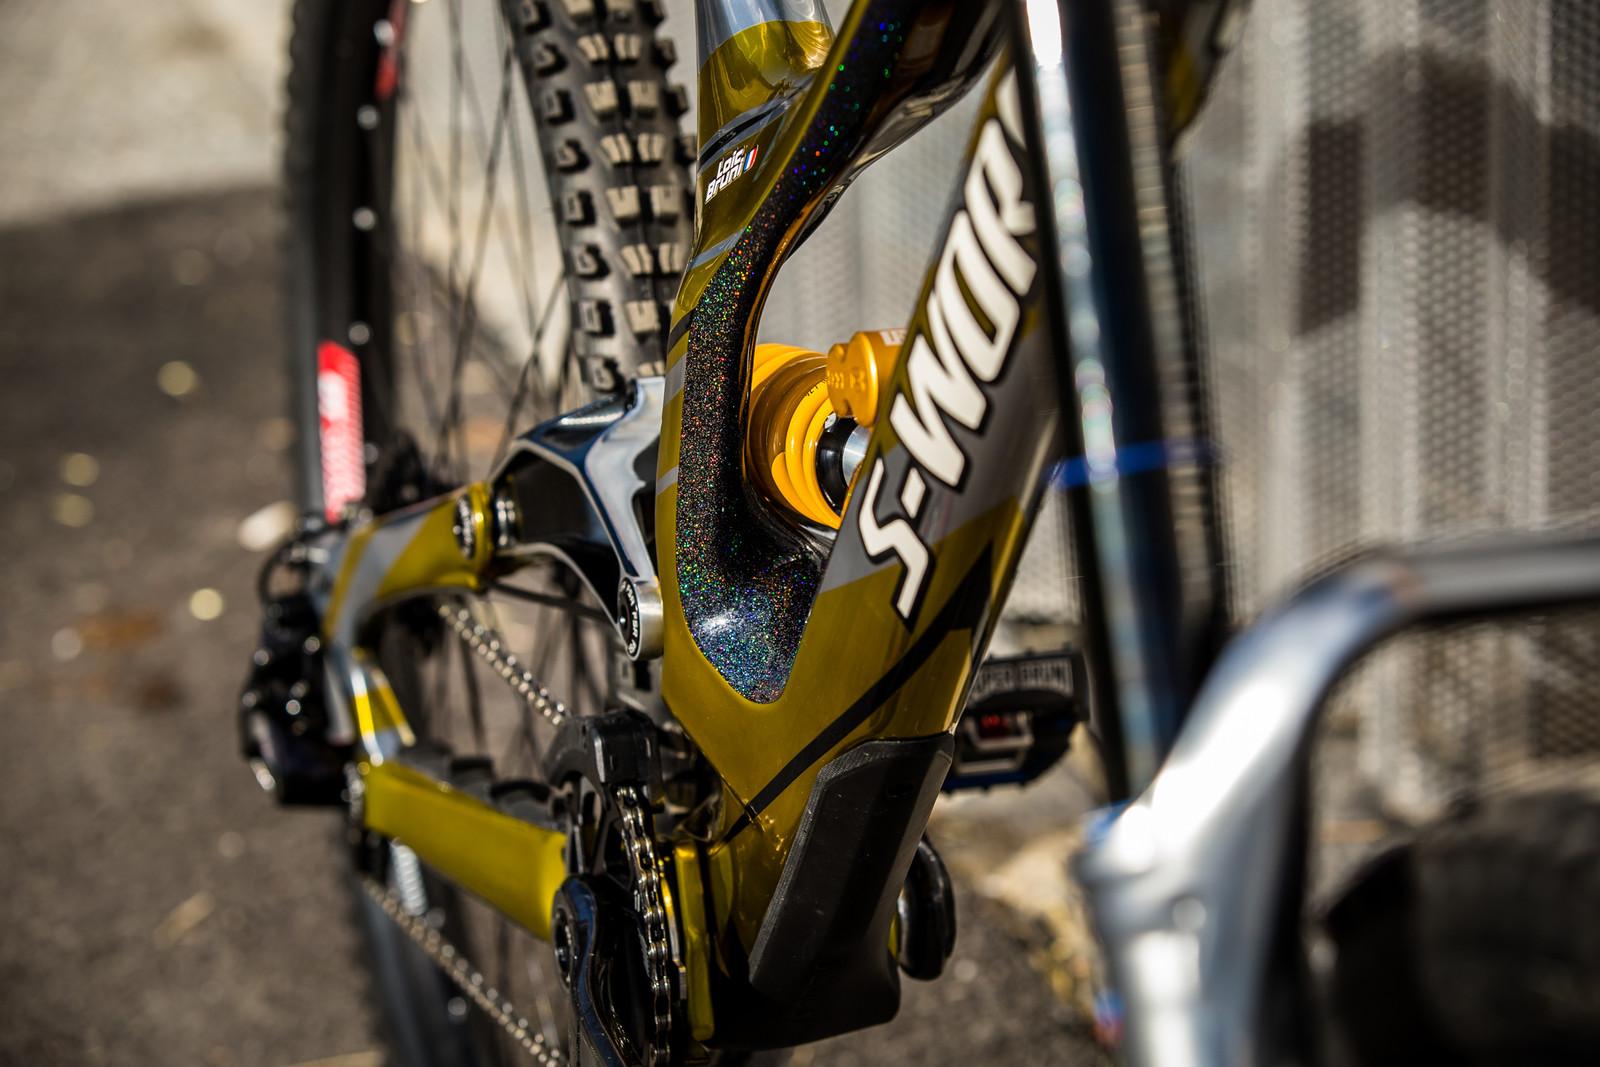 Sparkle Bonus - WORLD CHAMPS BIKE - Loic Bruni's Specialized Demo - Mountain Biking Pictures - Vital MTB